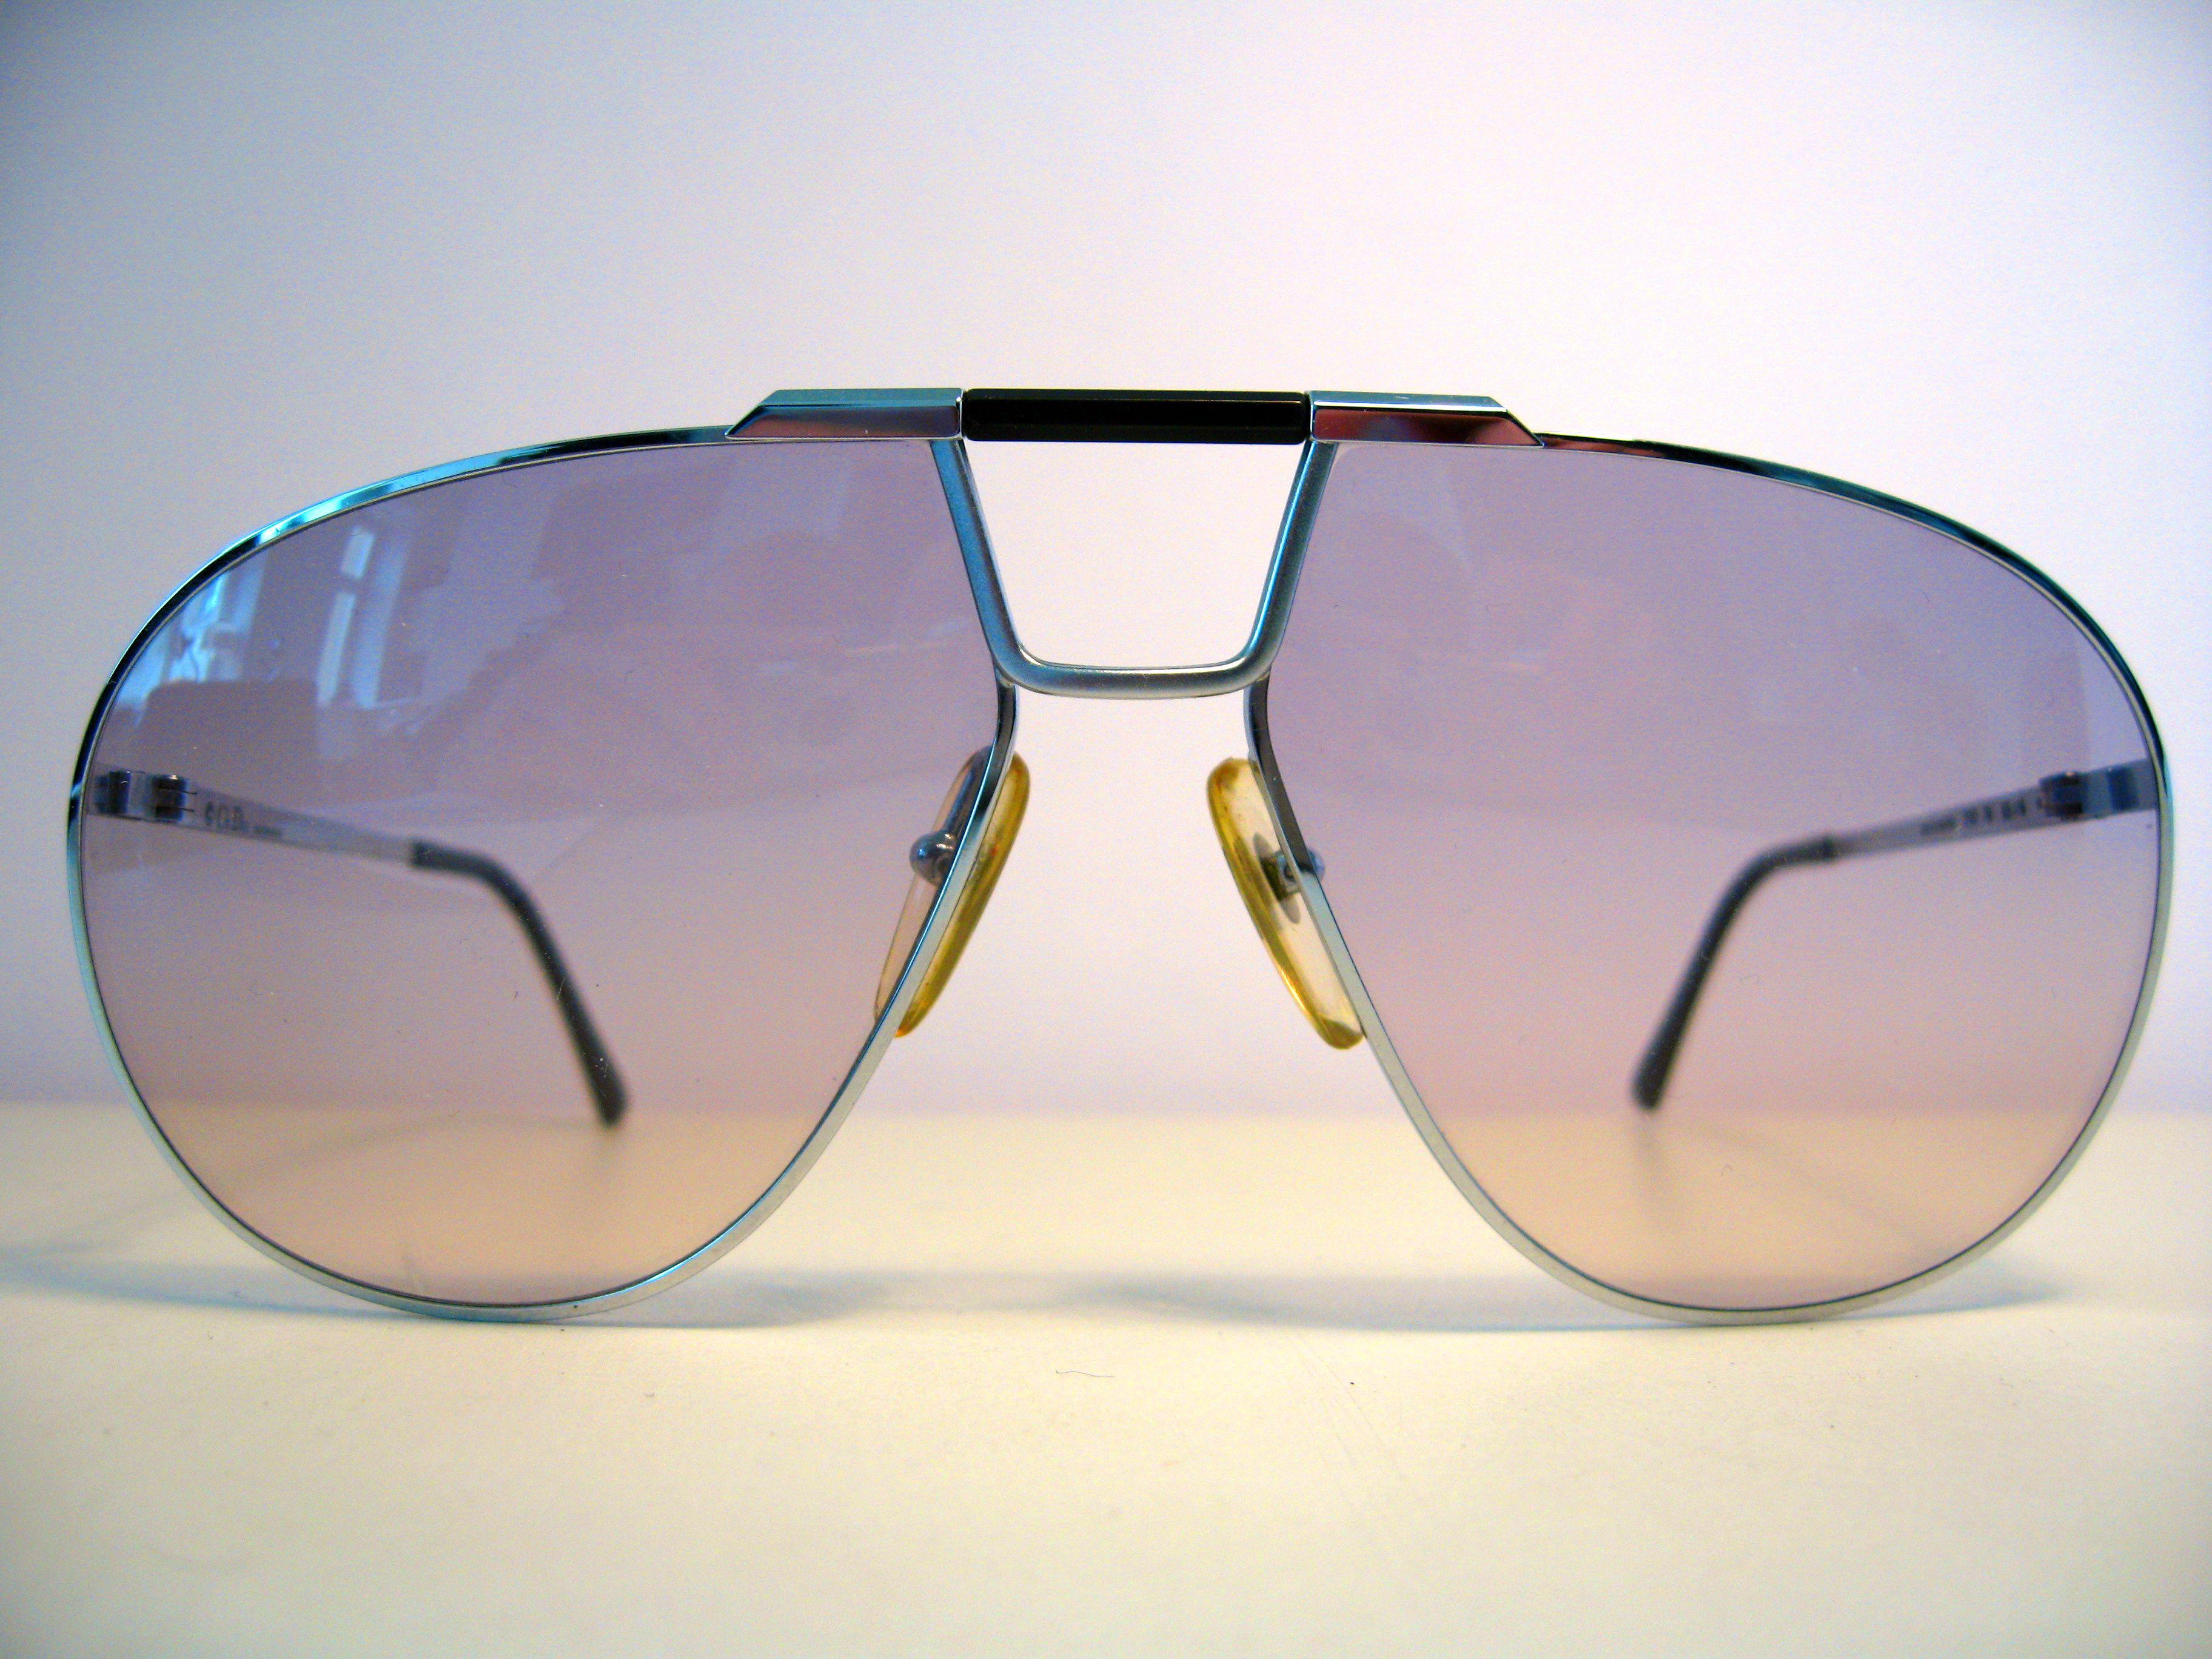 db773512d350 Vintage Christian Dior Aviator Sunglasses